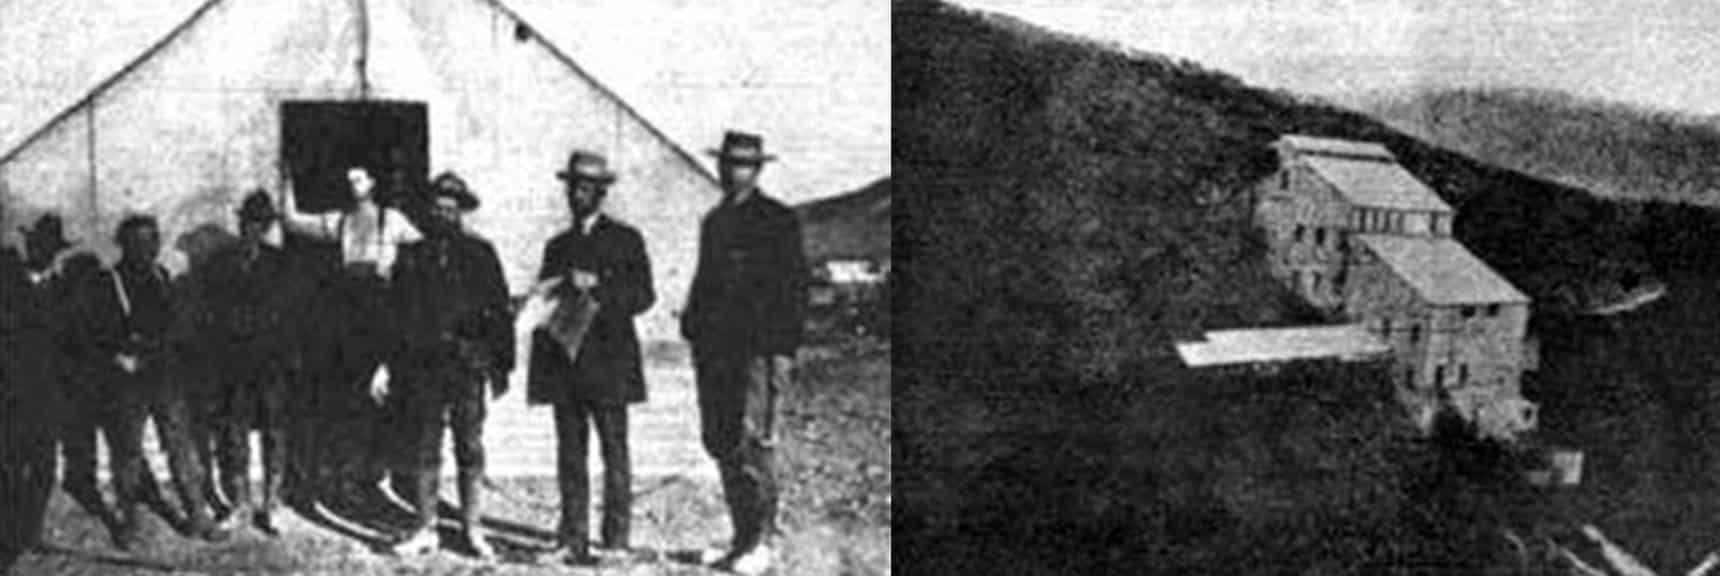 Skidoo News and Skidoo Mill | Skidoo Mill | Death Valley, California